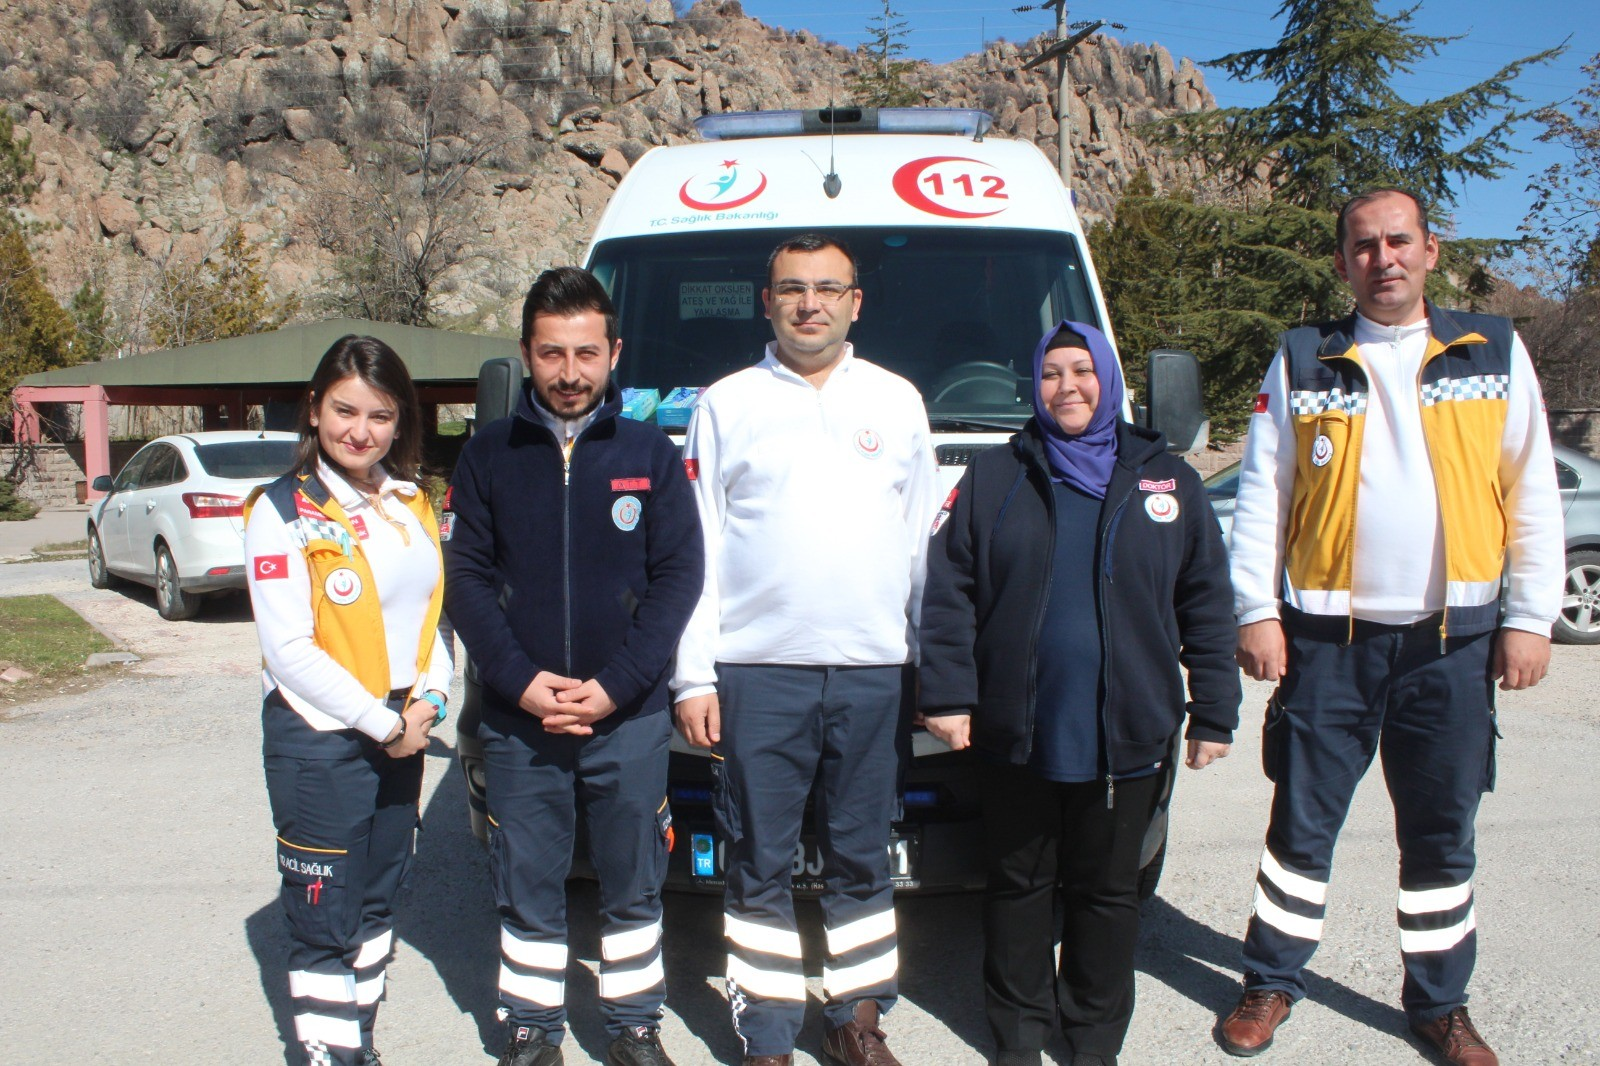 """ALTIN AMBULANS ÖDÜLLERİ""NE AFYONKARAHİSAR'DAN ADAY"